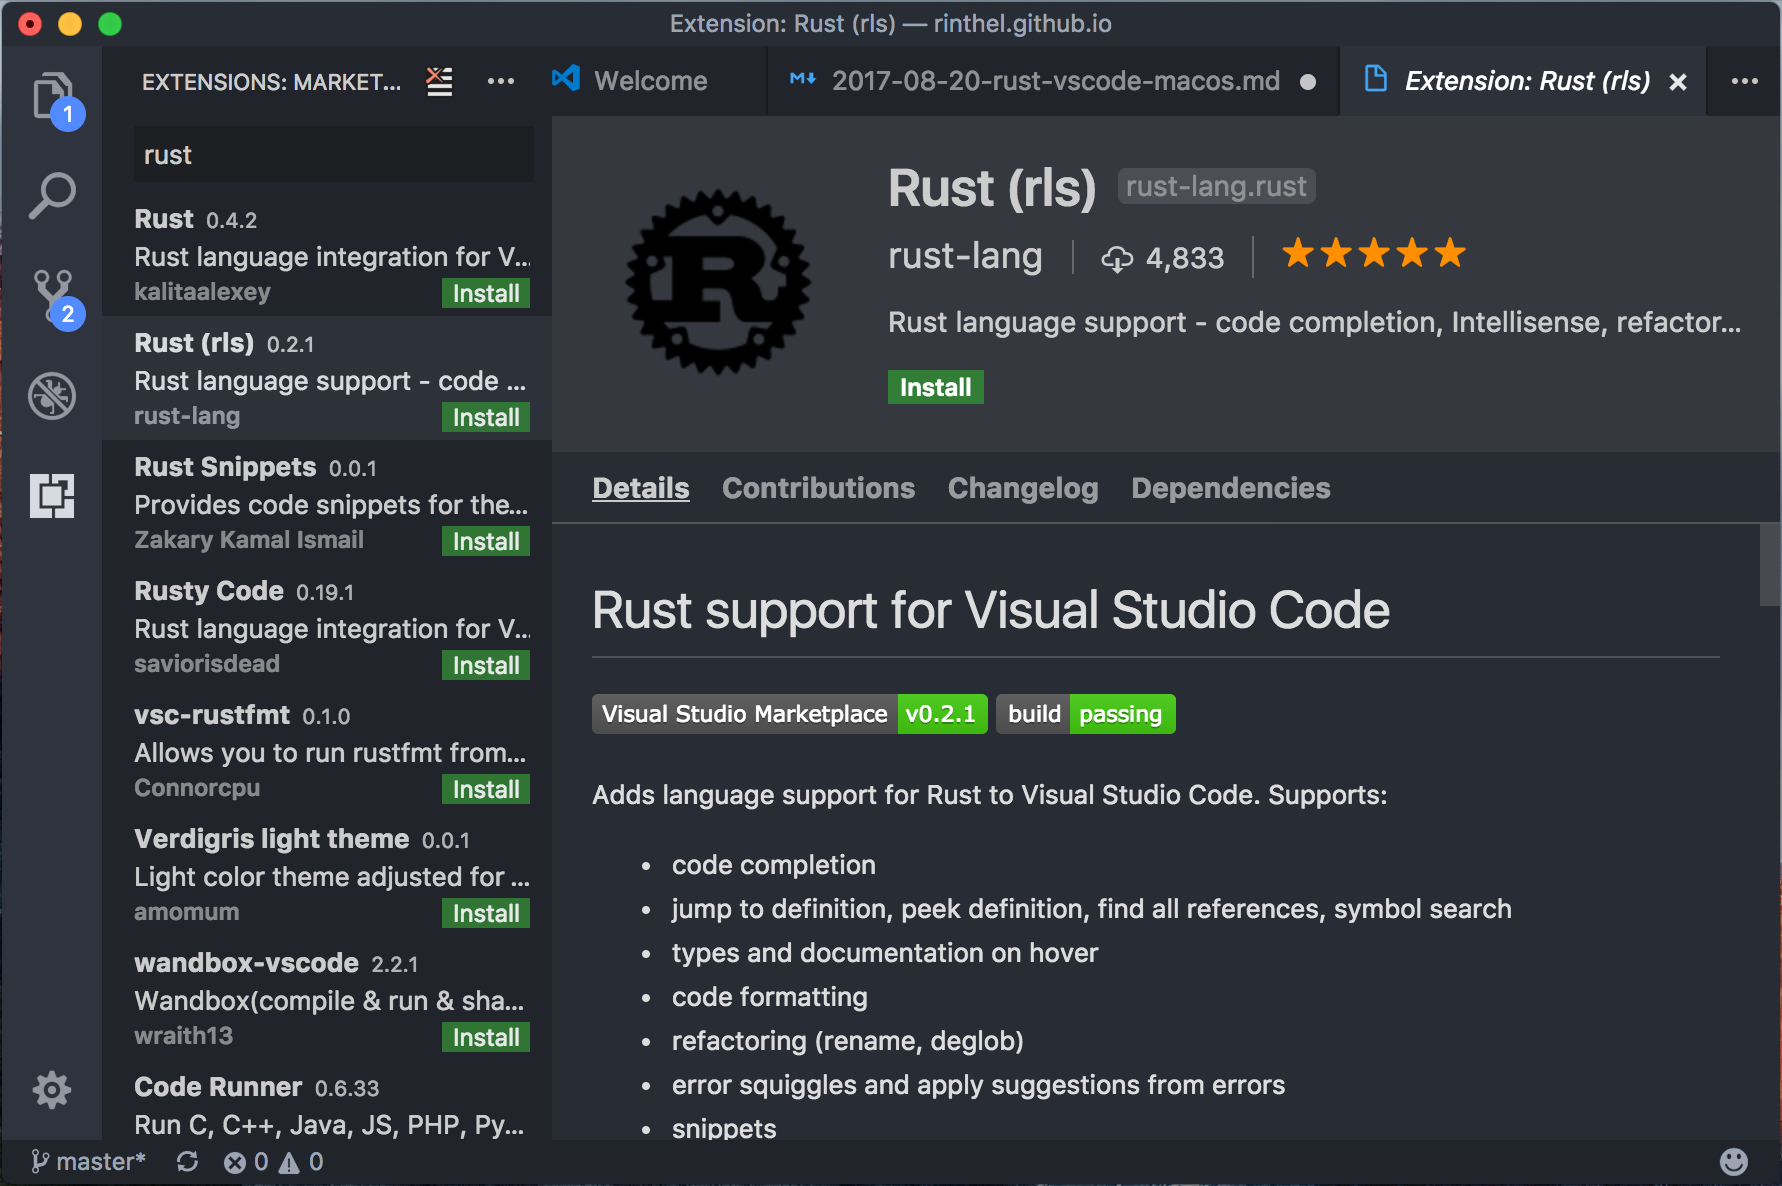 vscode extension - rust rls